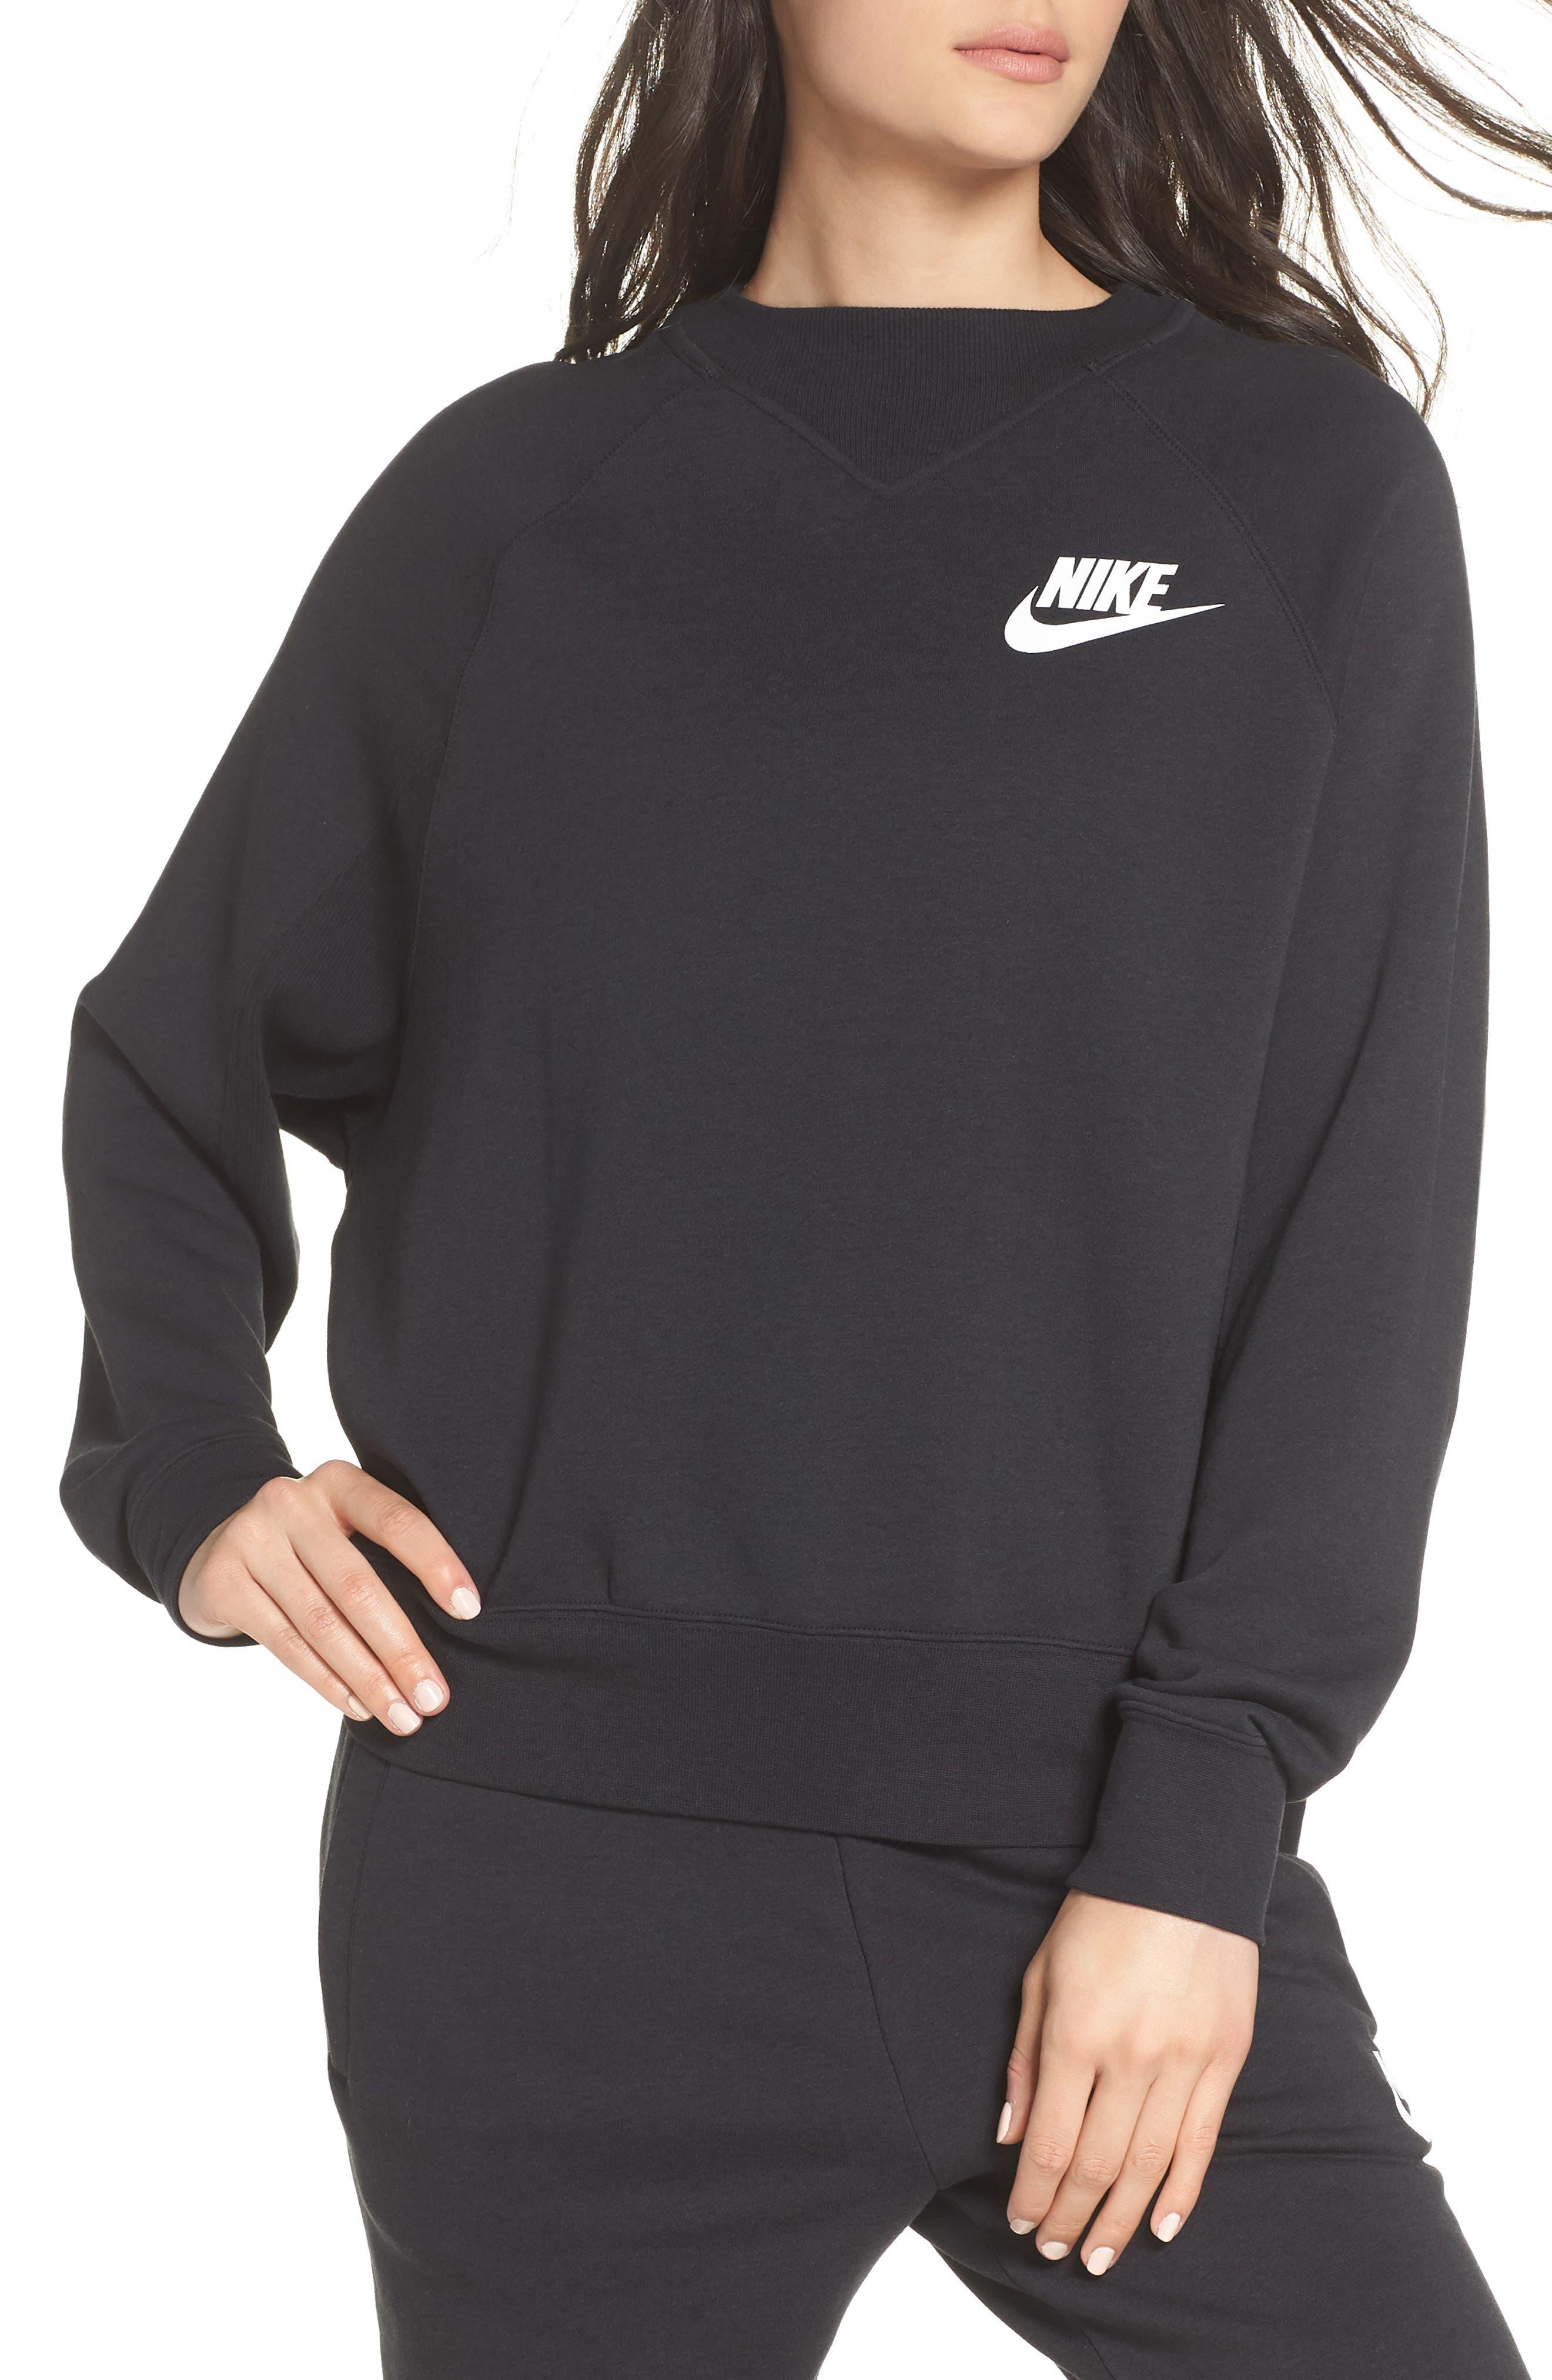 NIKE Sportswear Rally Sweatshirt, Main, color, 010